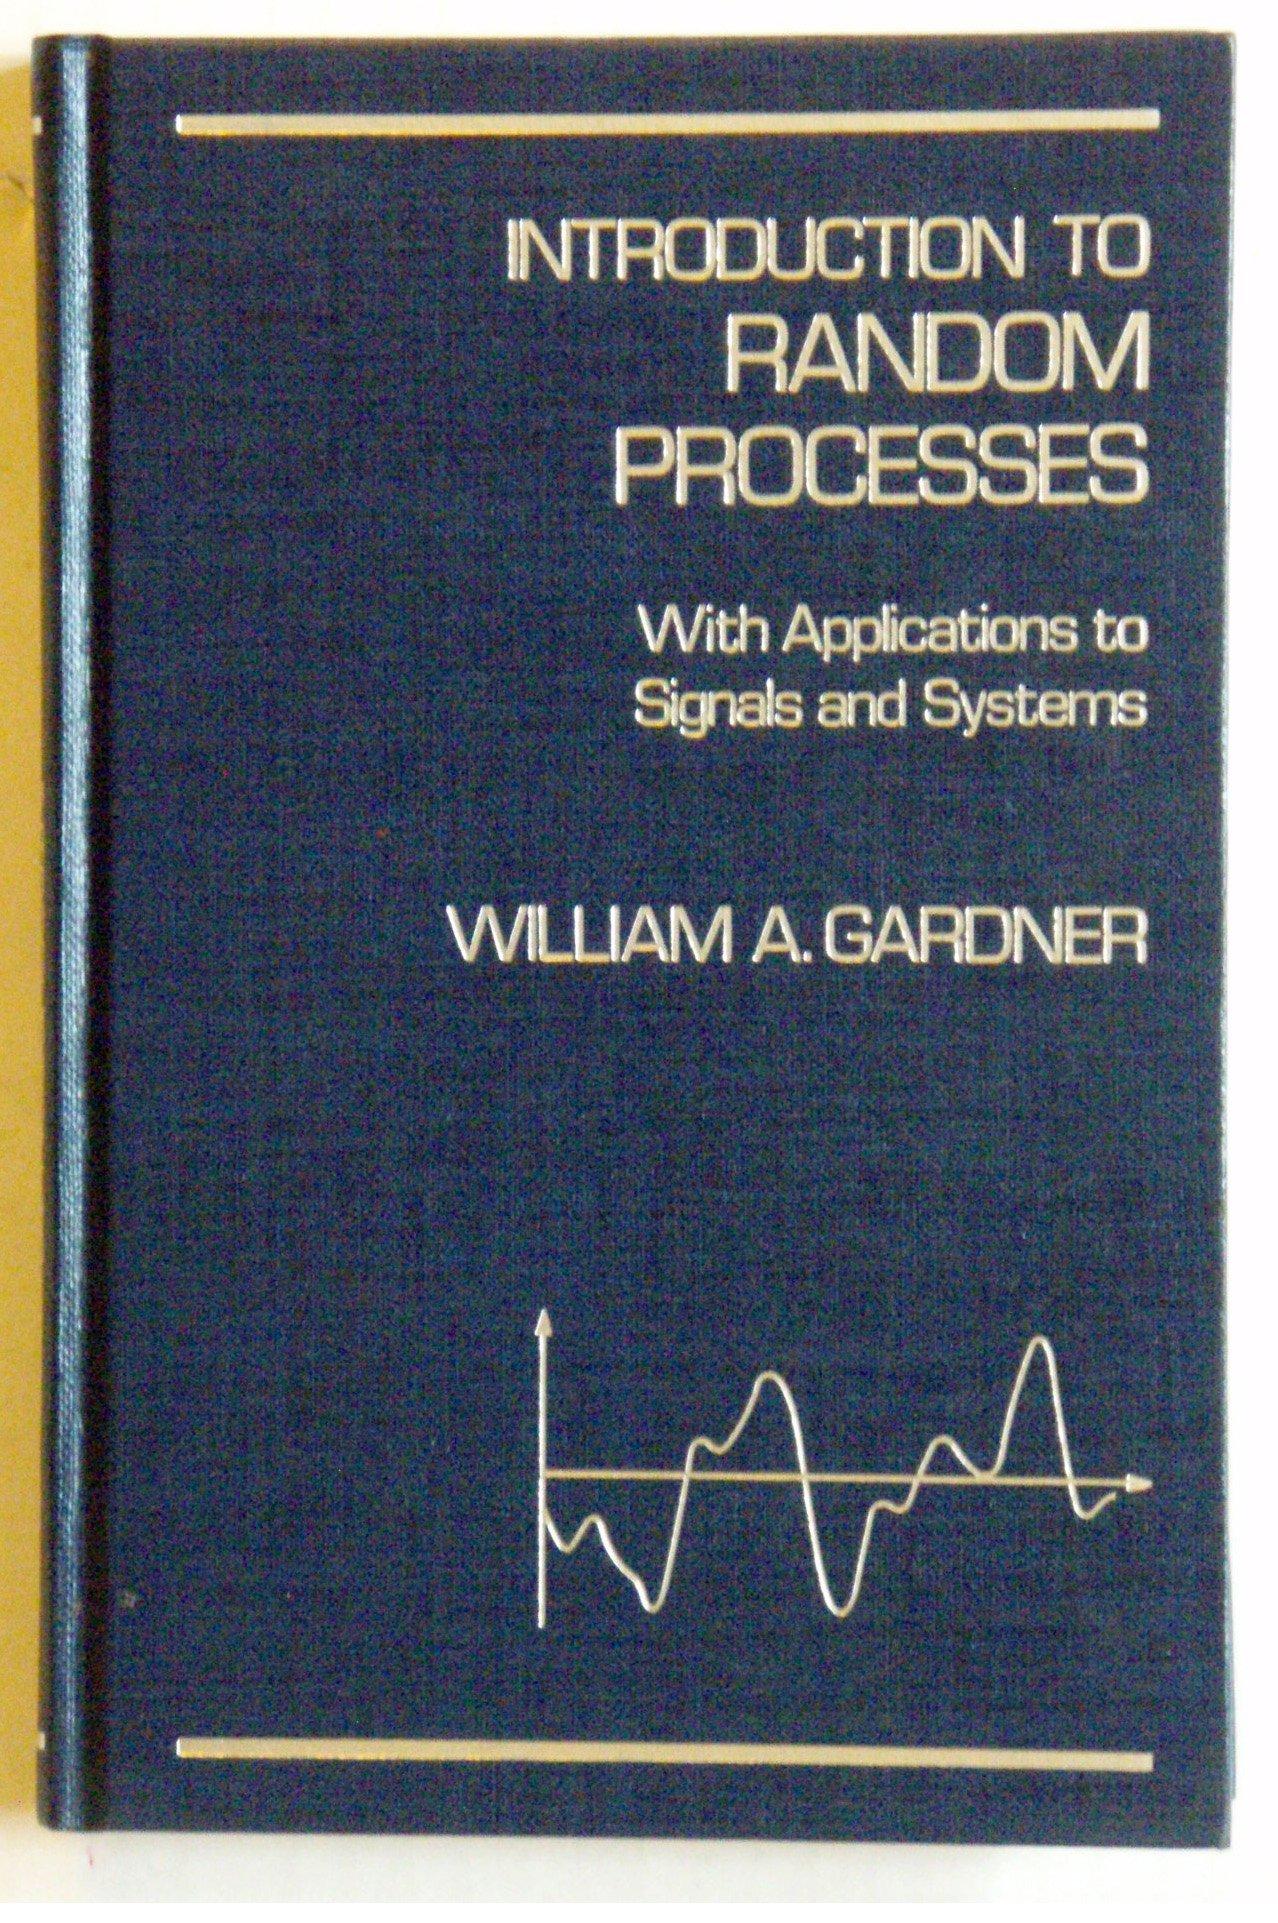 Introduction To Random Processes